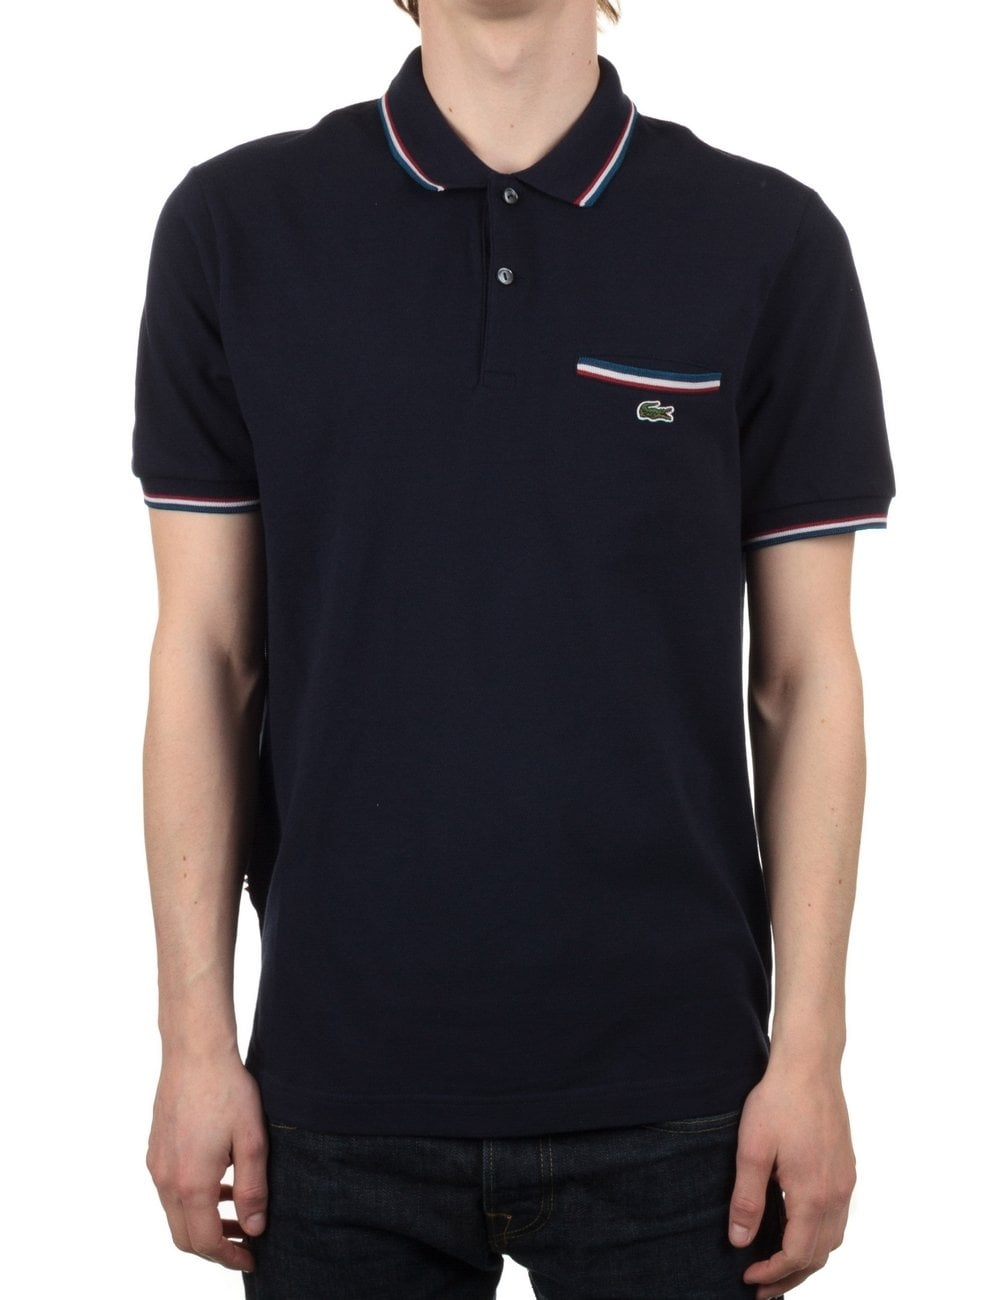 c625c51c01 Lacoste Live Short Sleeve Ribbed Polo - Marine Navy - Clothing from ...